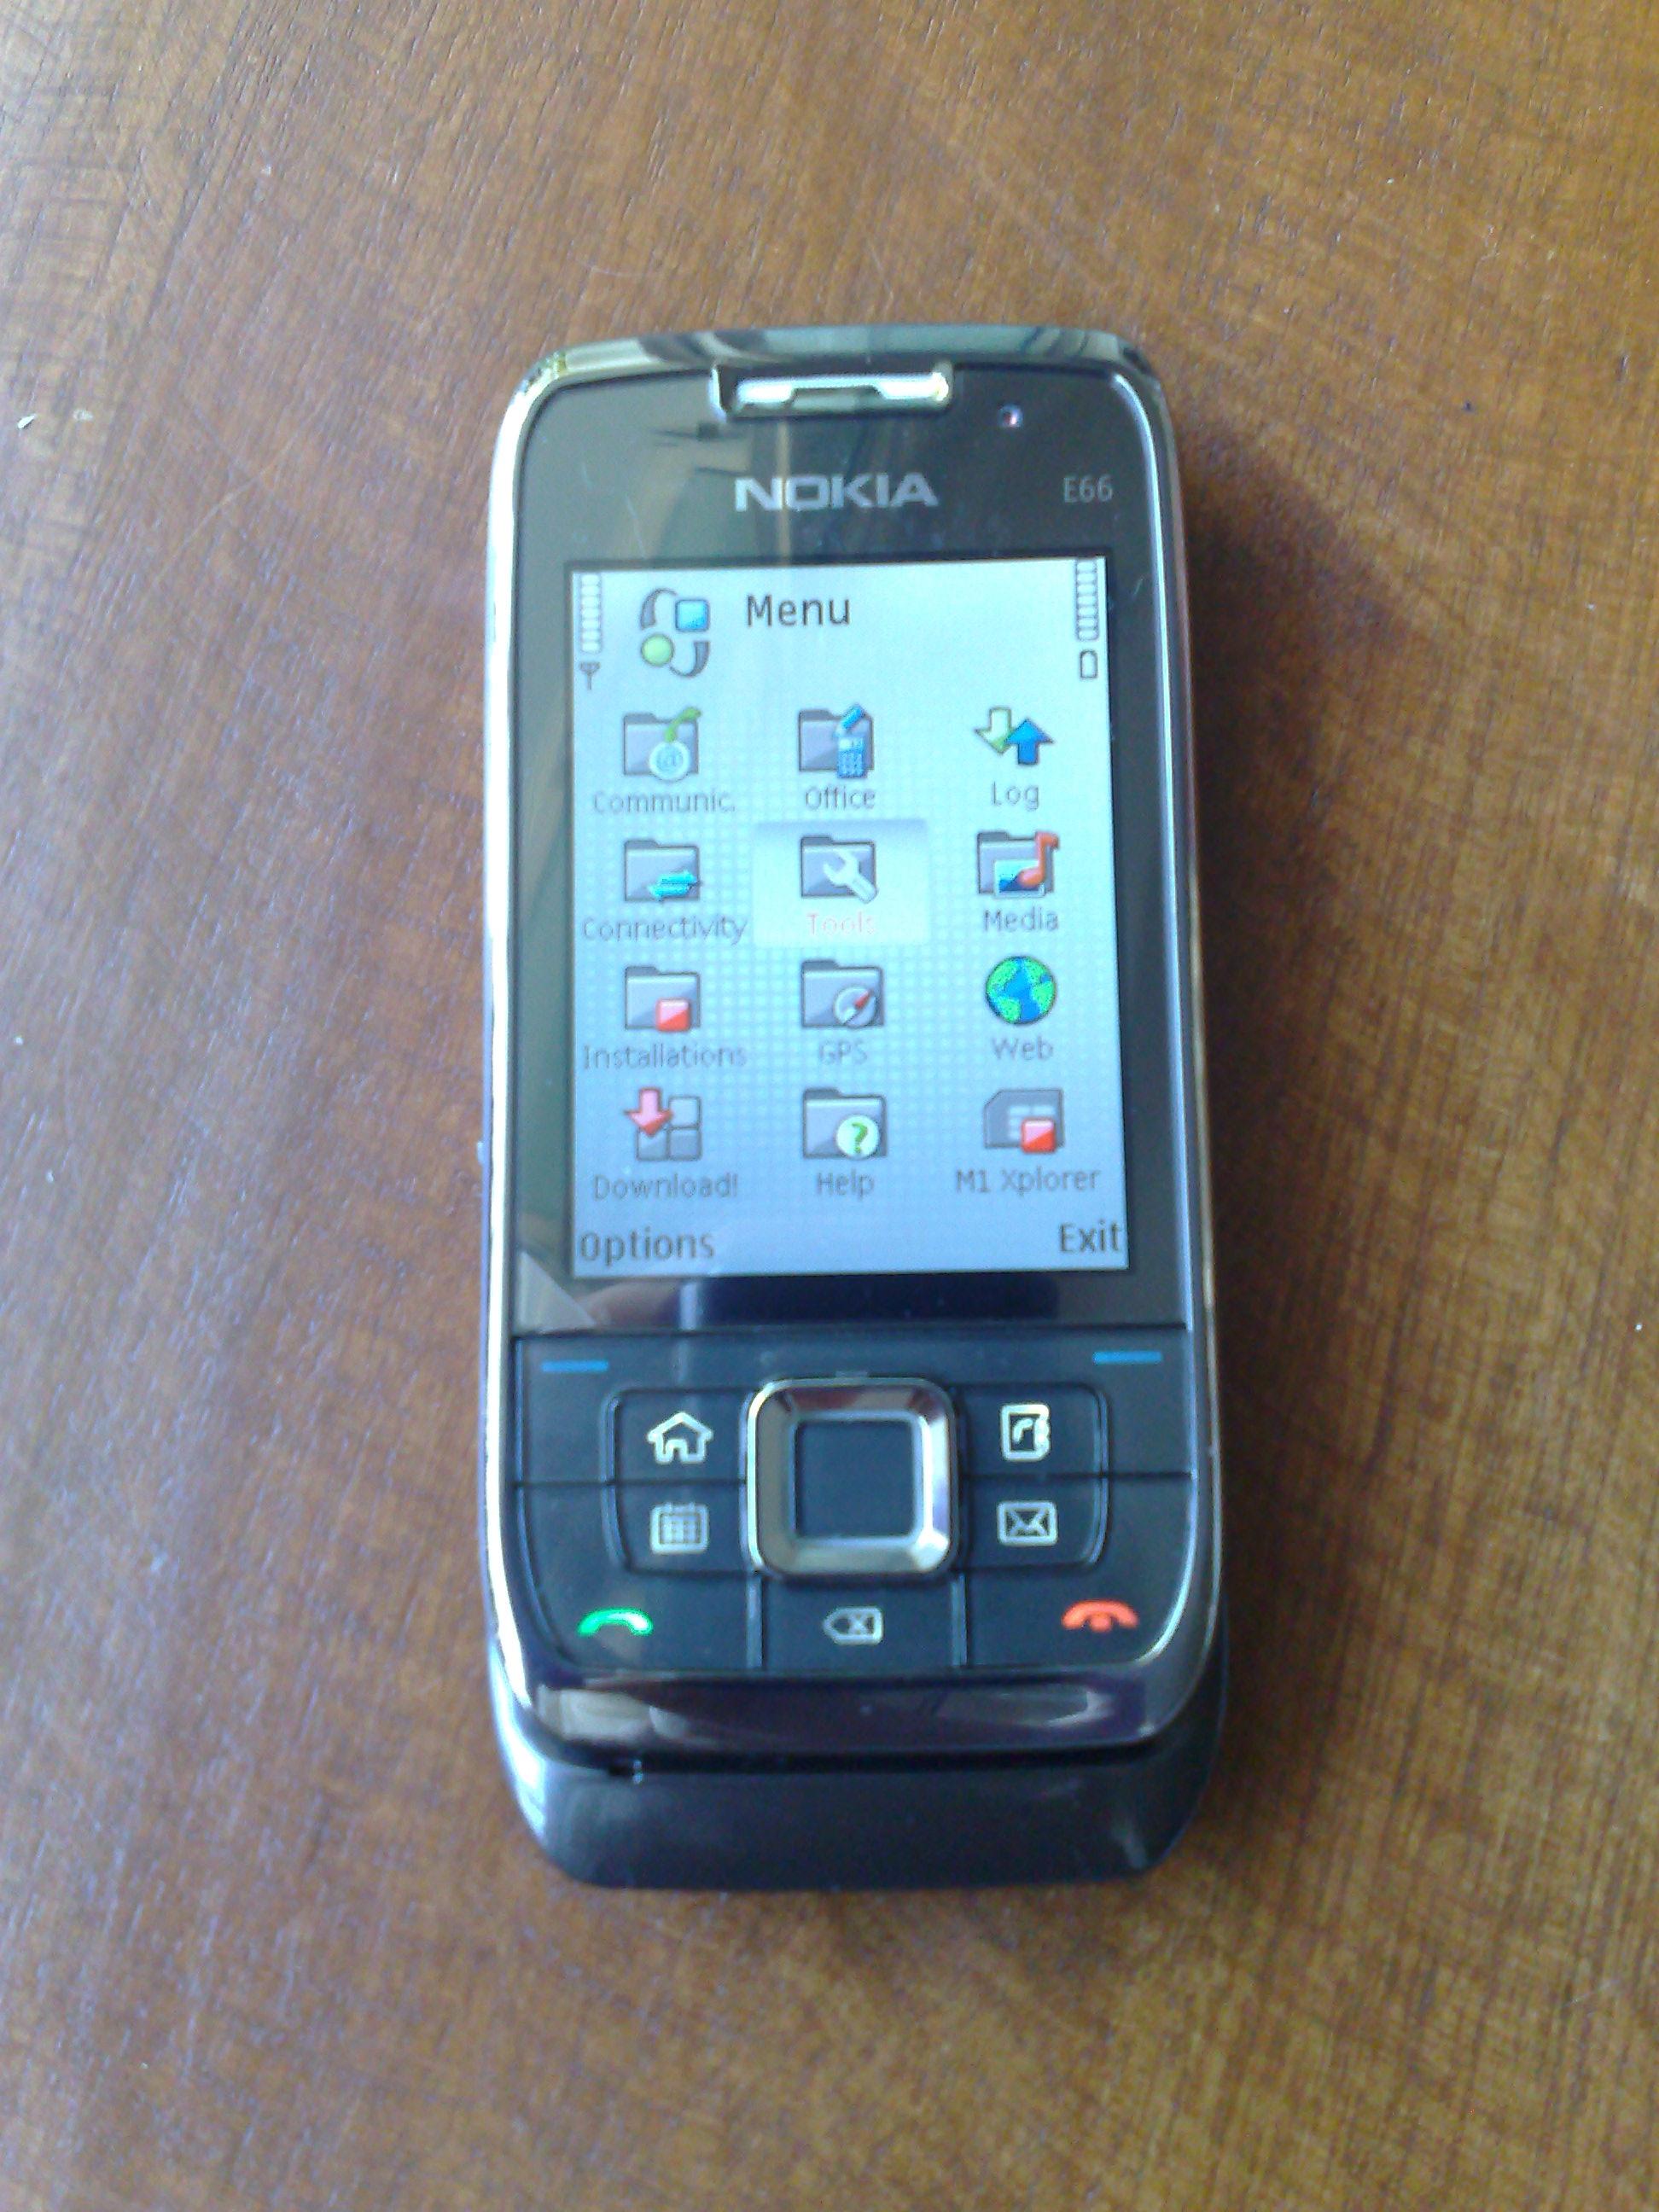 Nokia E66 Mini-Review – Zit Seng's Blog